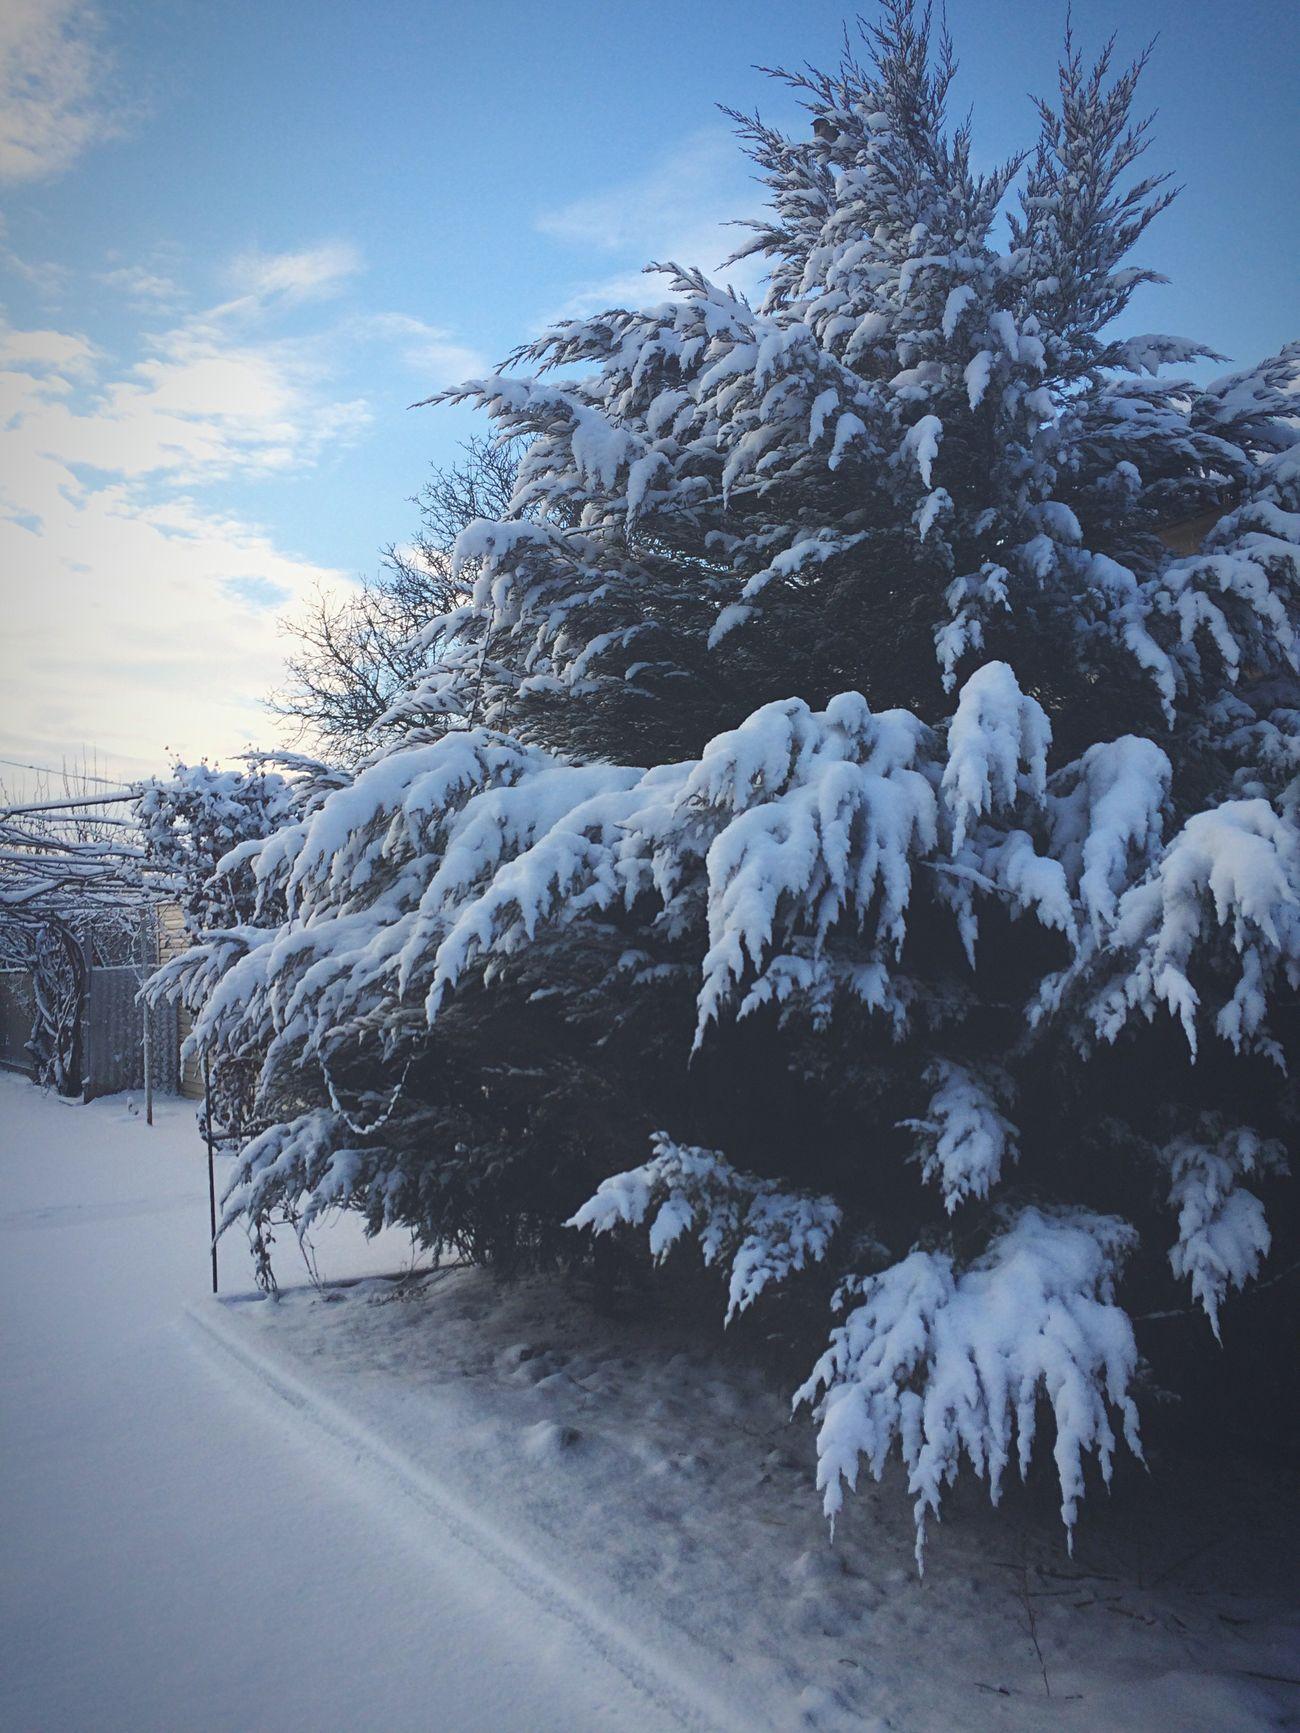 Ukraine 2017 January 2017 Snow Winter Photography Photo Cold Temperature Tree Morning Мариуполь украина зима январь снег утро фото Mariupol